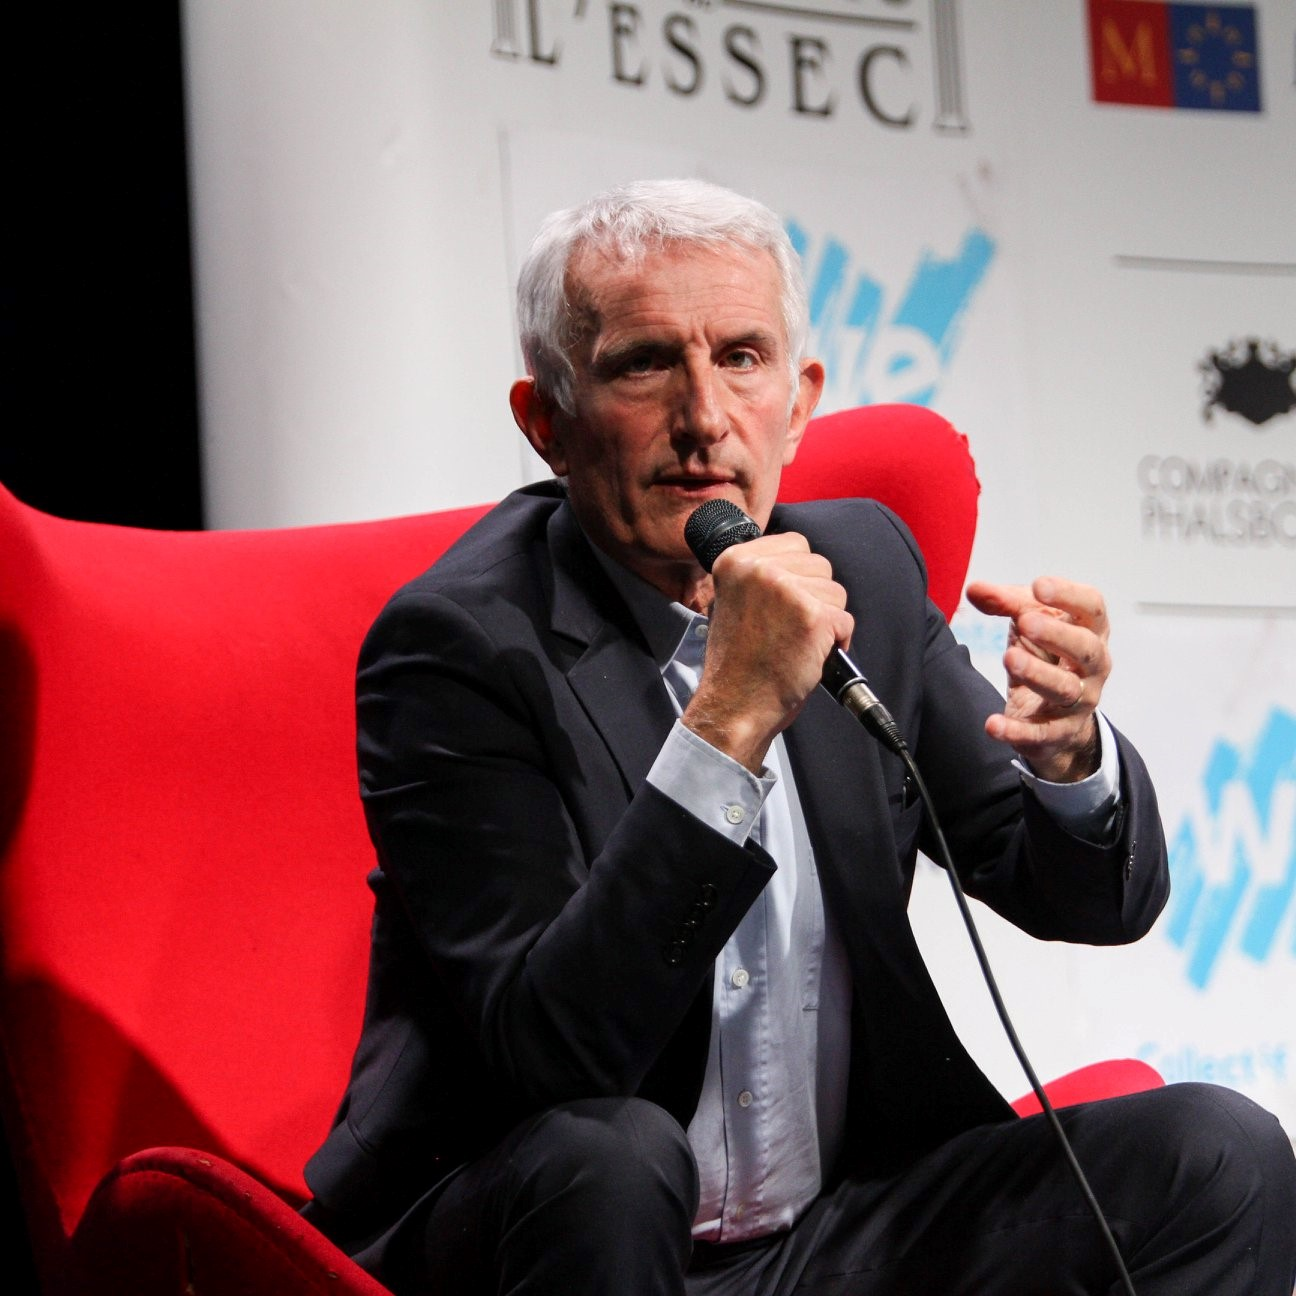 Guillaume Pépy